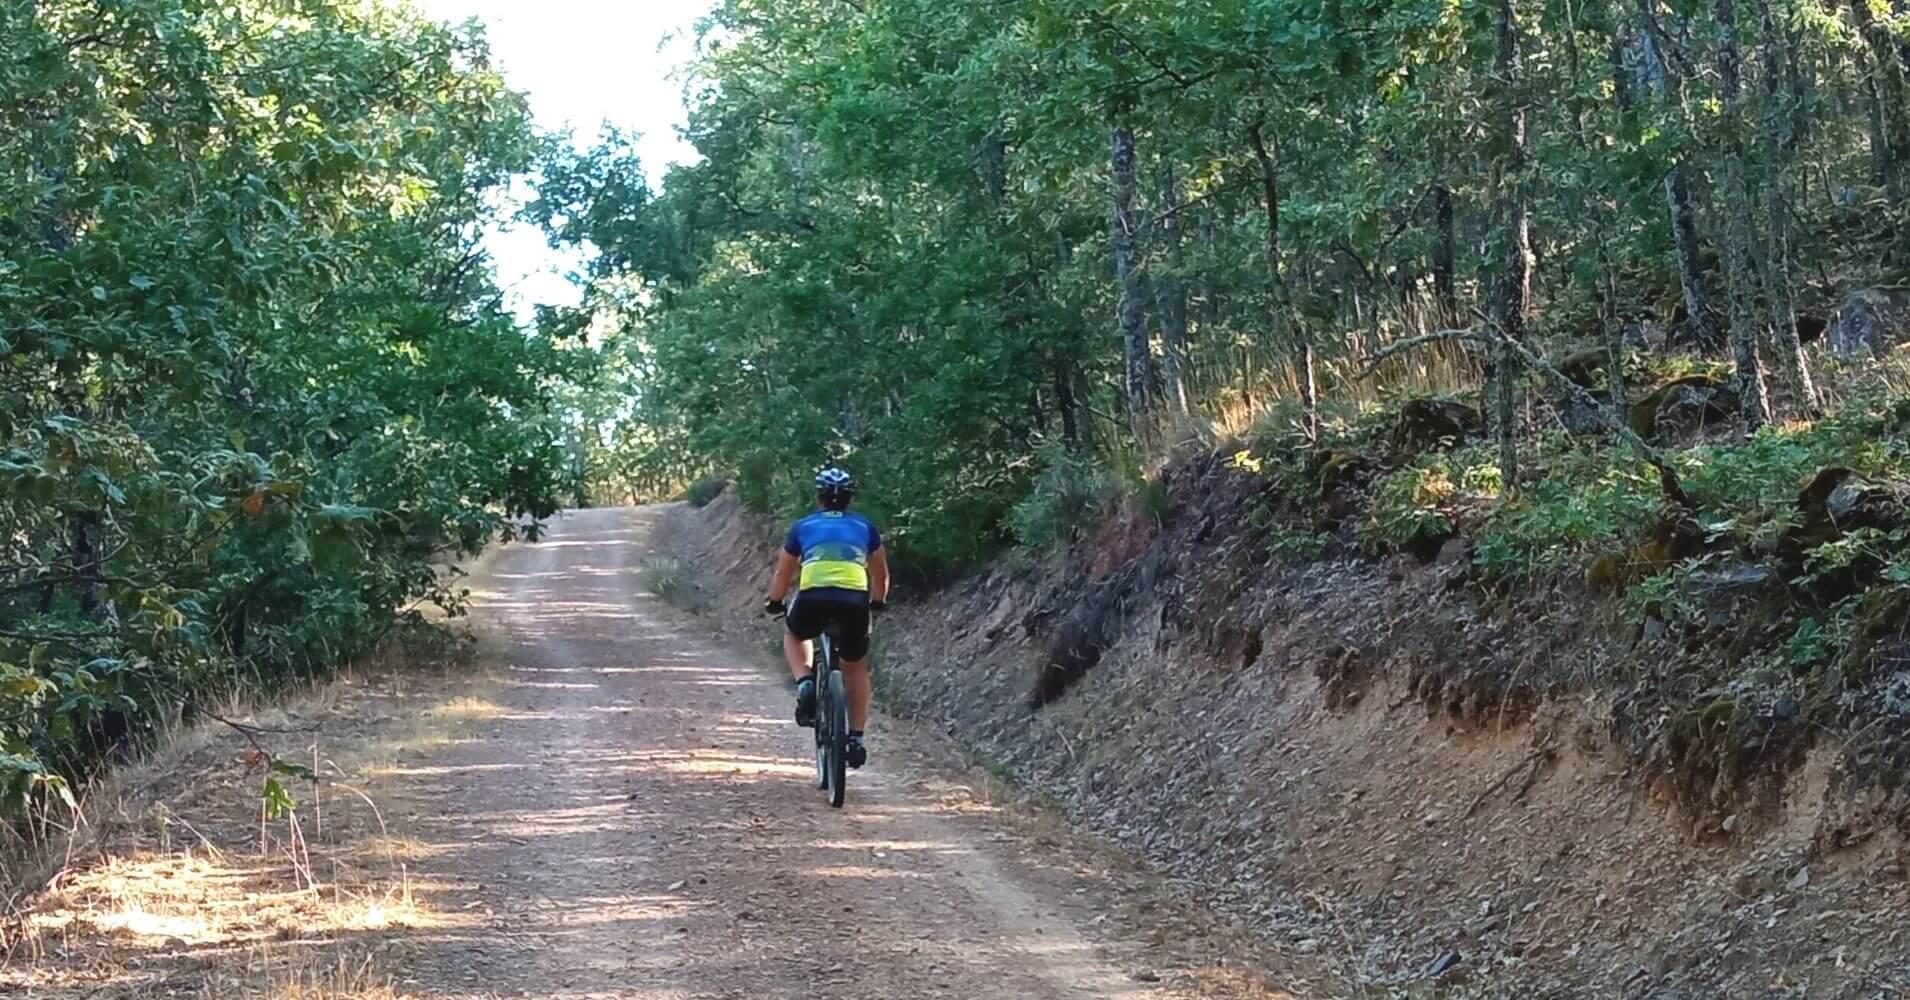 Ruta Mountain Bike en Los Montes de Toledo. Castilla la Mancha.